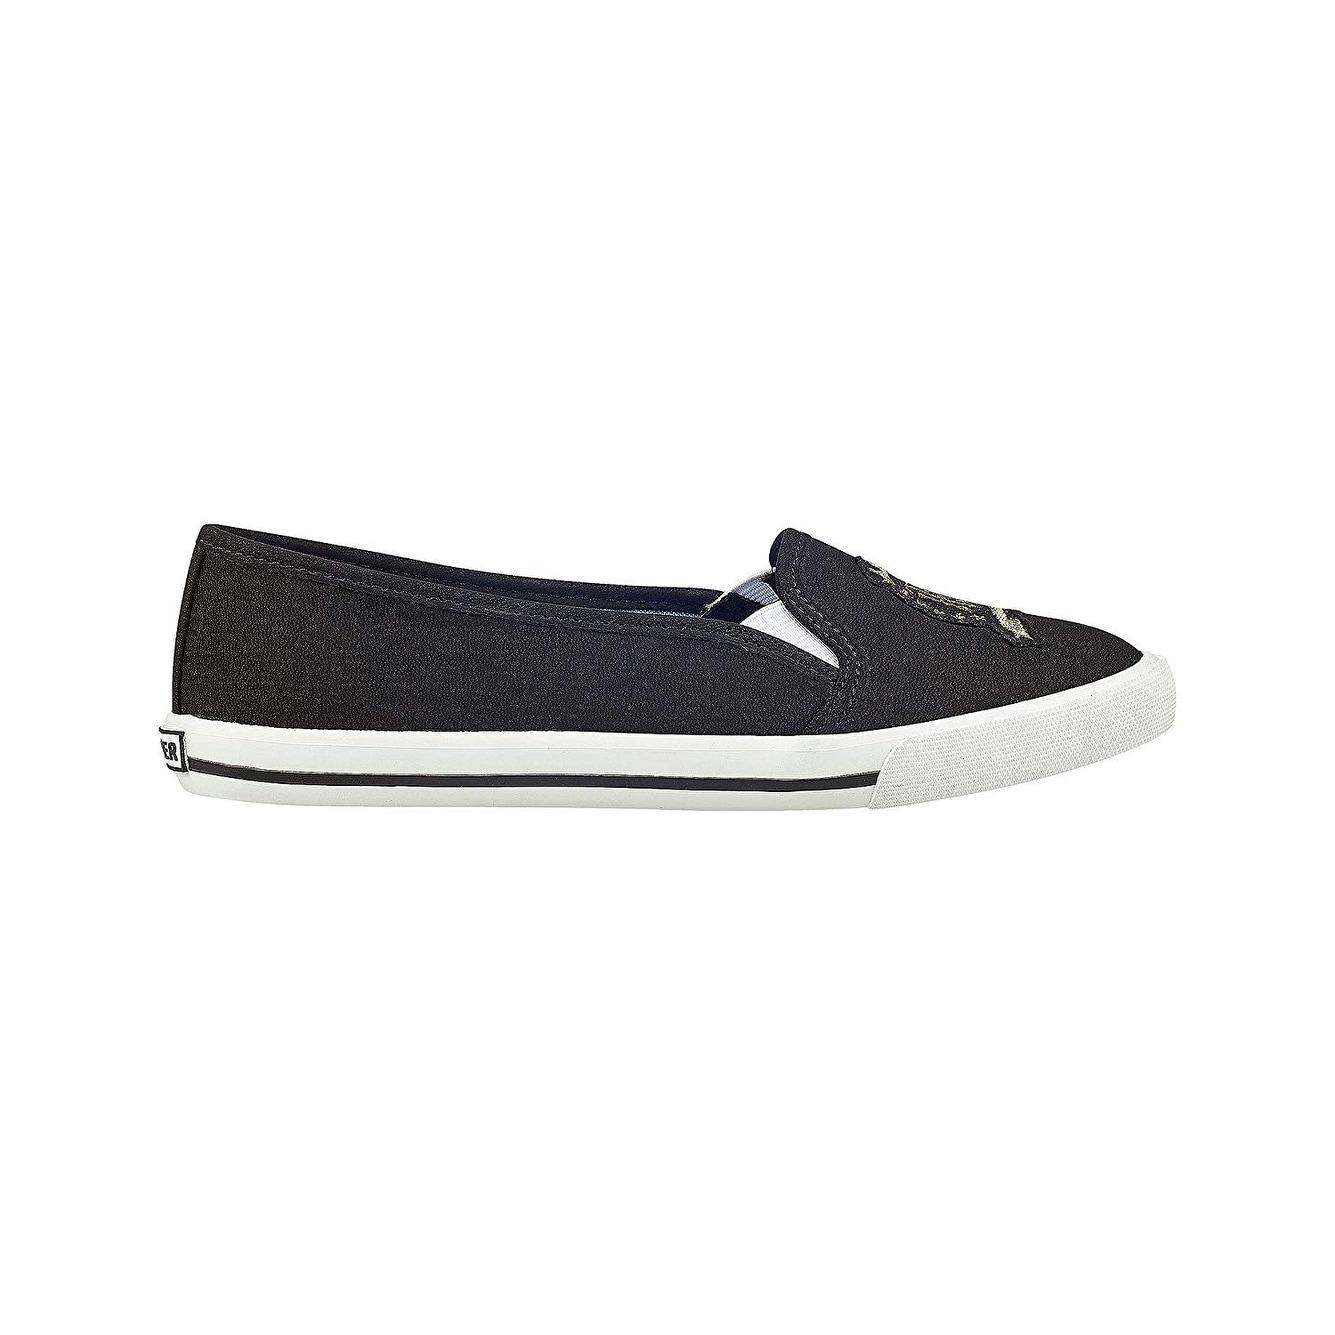 37857aa54176 Tommy Hilfiger Women s Shoes